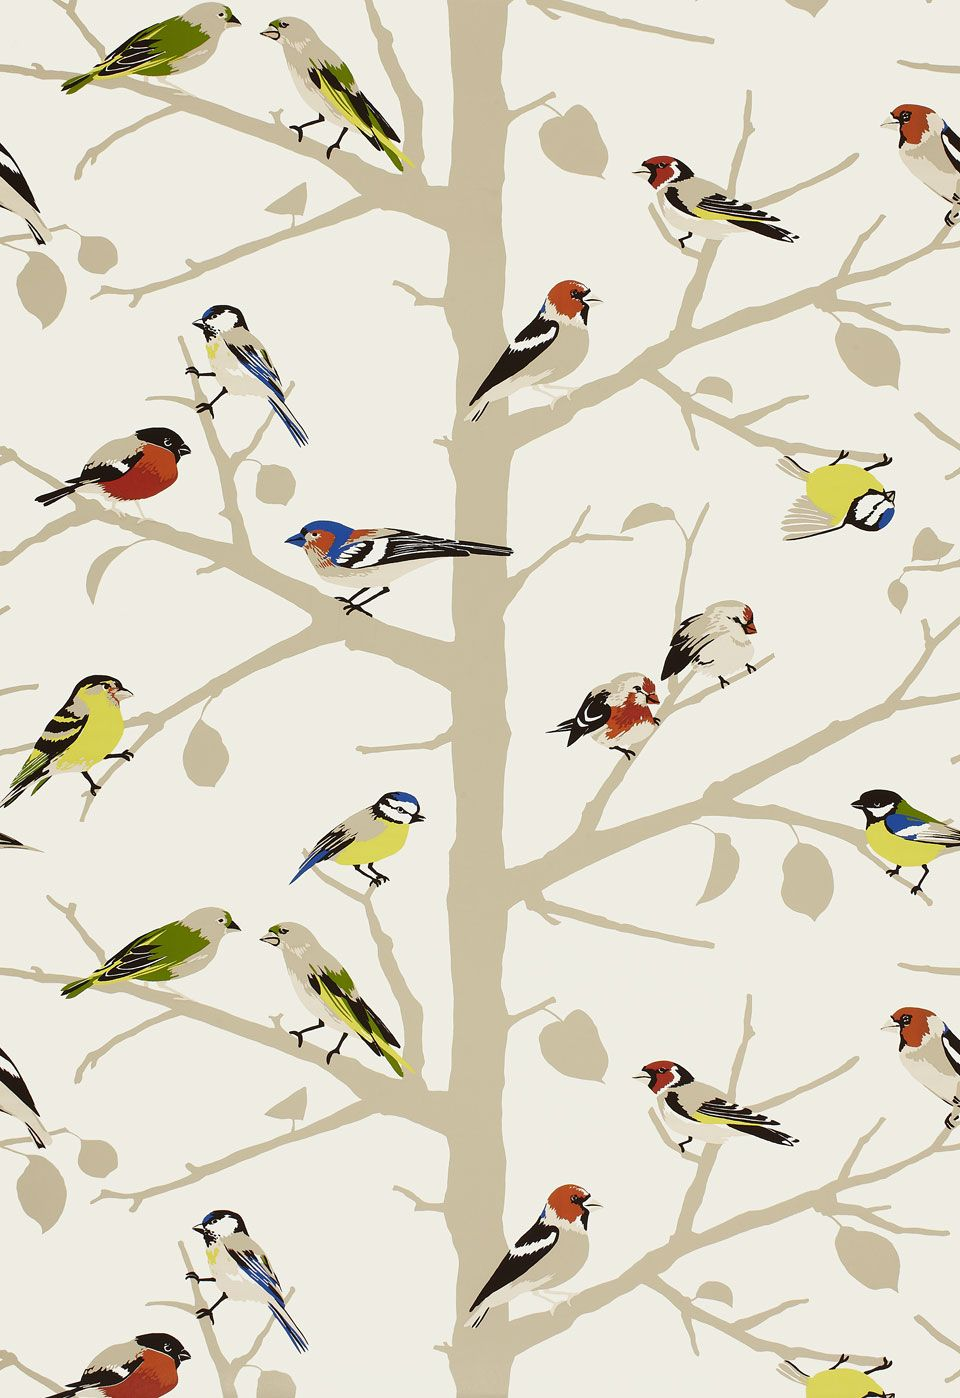 sarah s house powder room bird wallpaper source for the birds